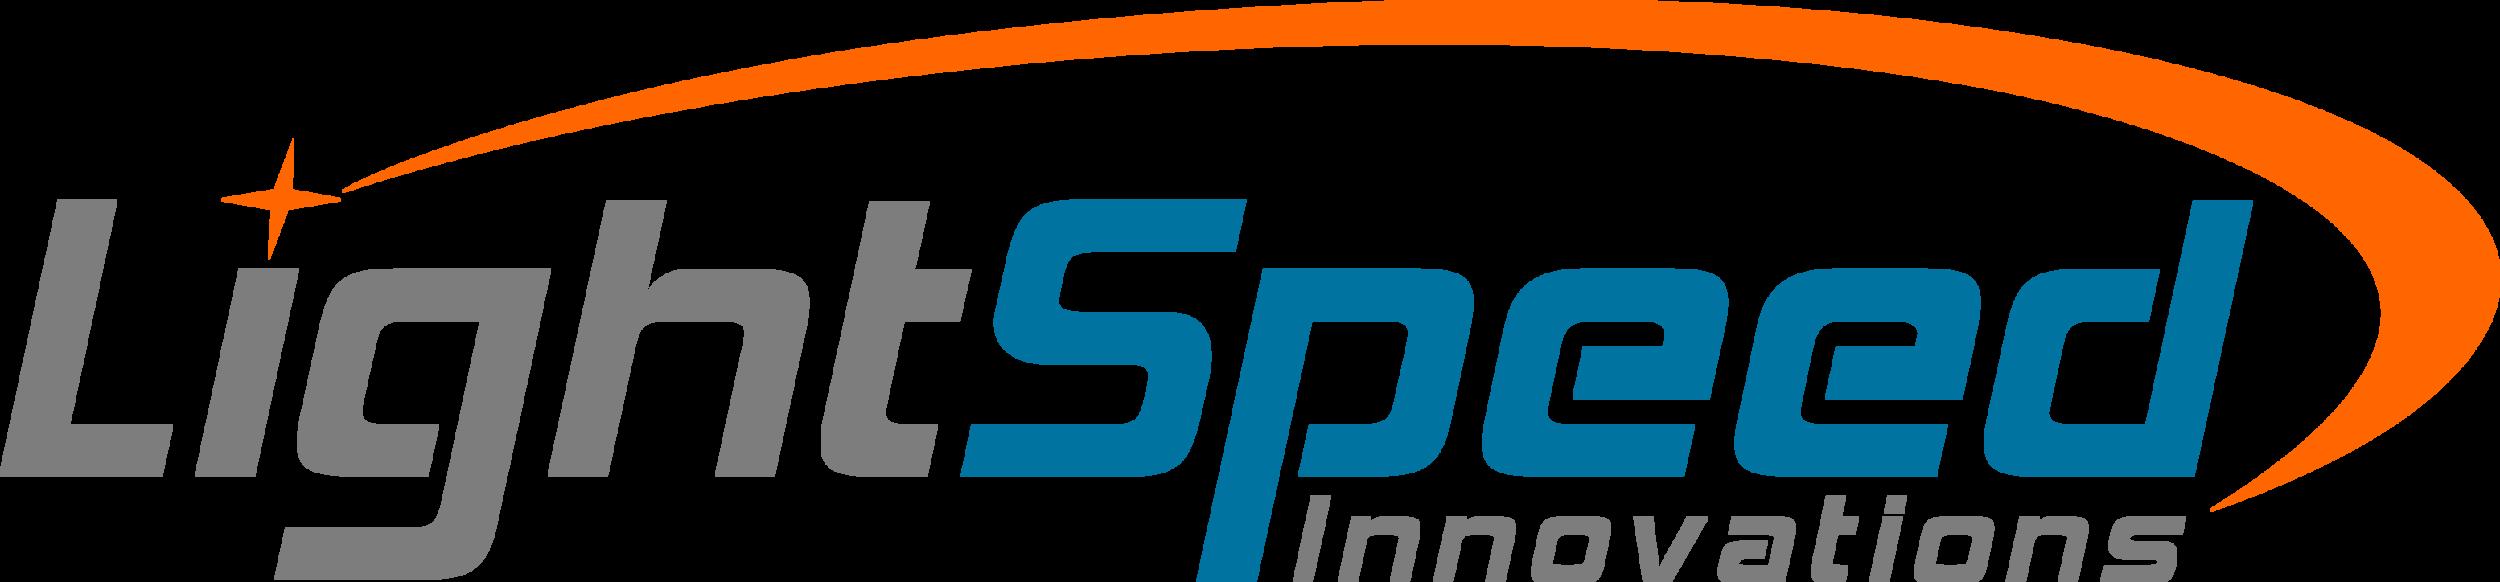 LightSpeed Innovations.png